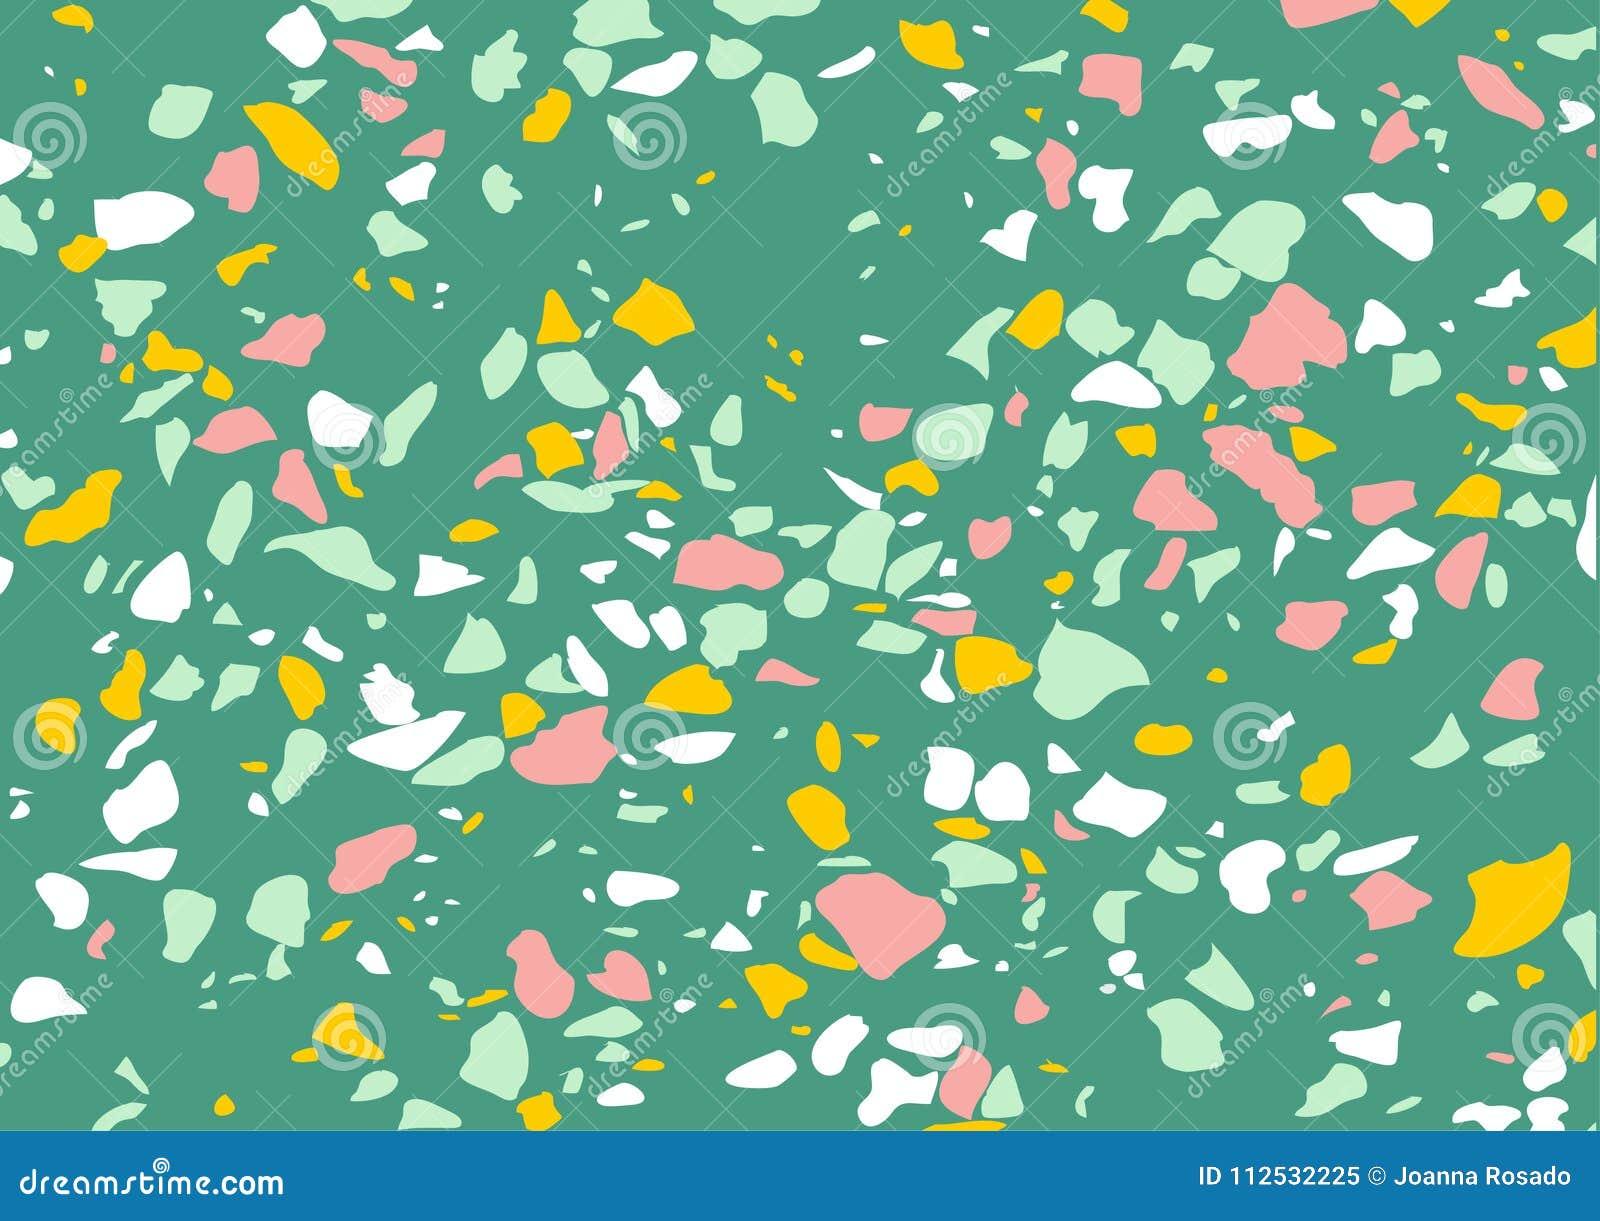 Download Terrazzo Marble Vector Texture Trendy Background Floor Pattern Surface Modern Interior Design